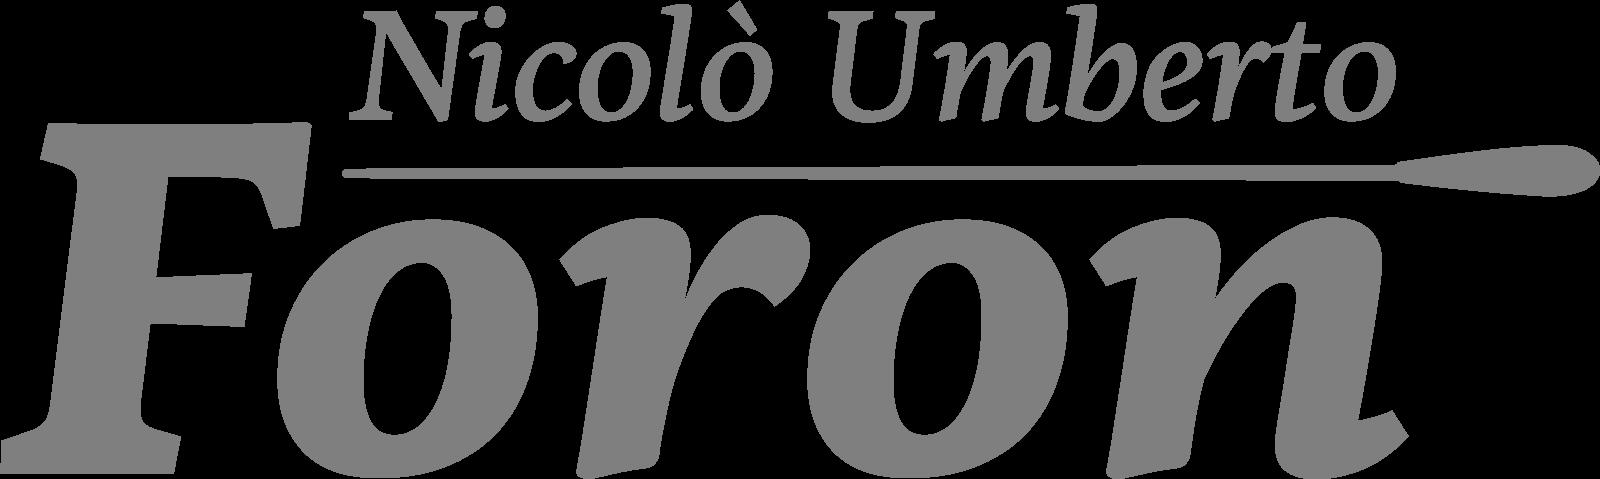 Logo Nicolò Umberto Foron